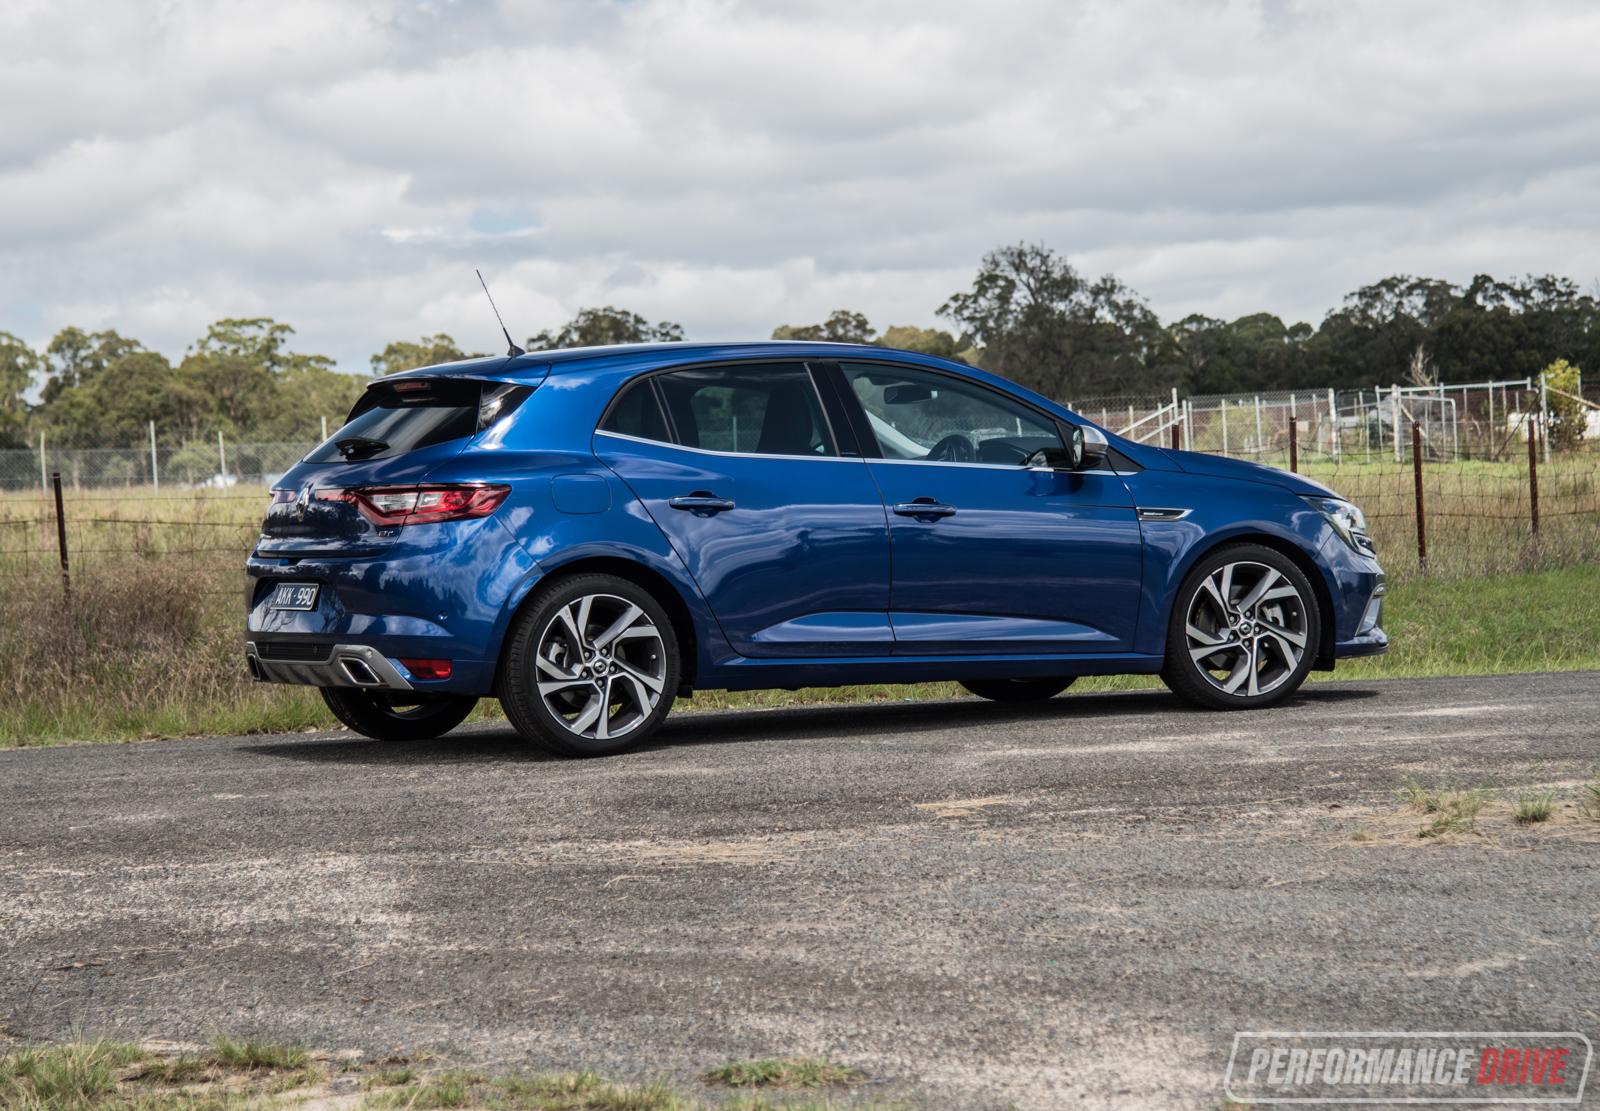 2017 Renault Megane Gt Review  Video